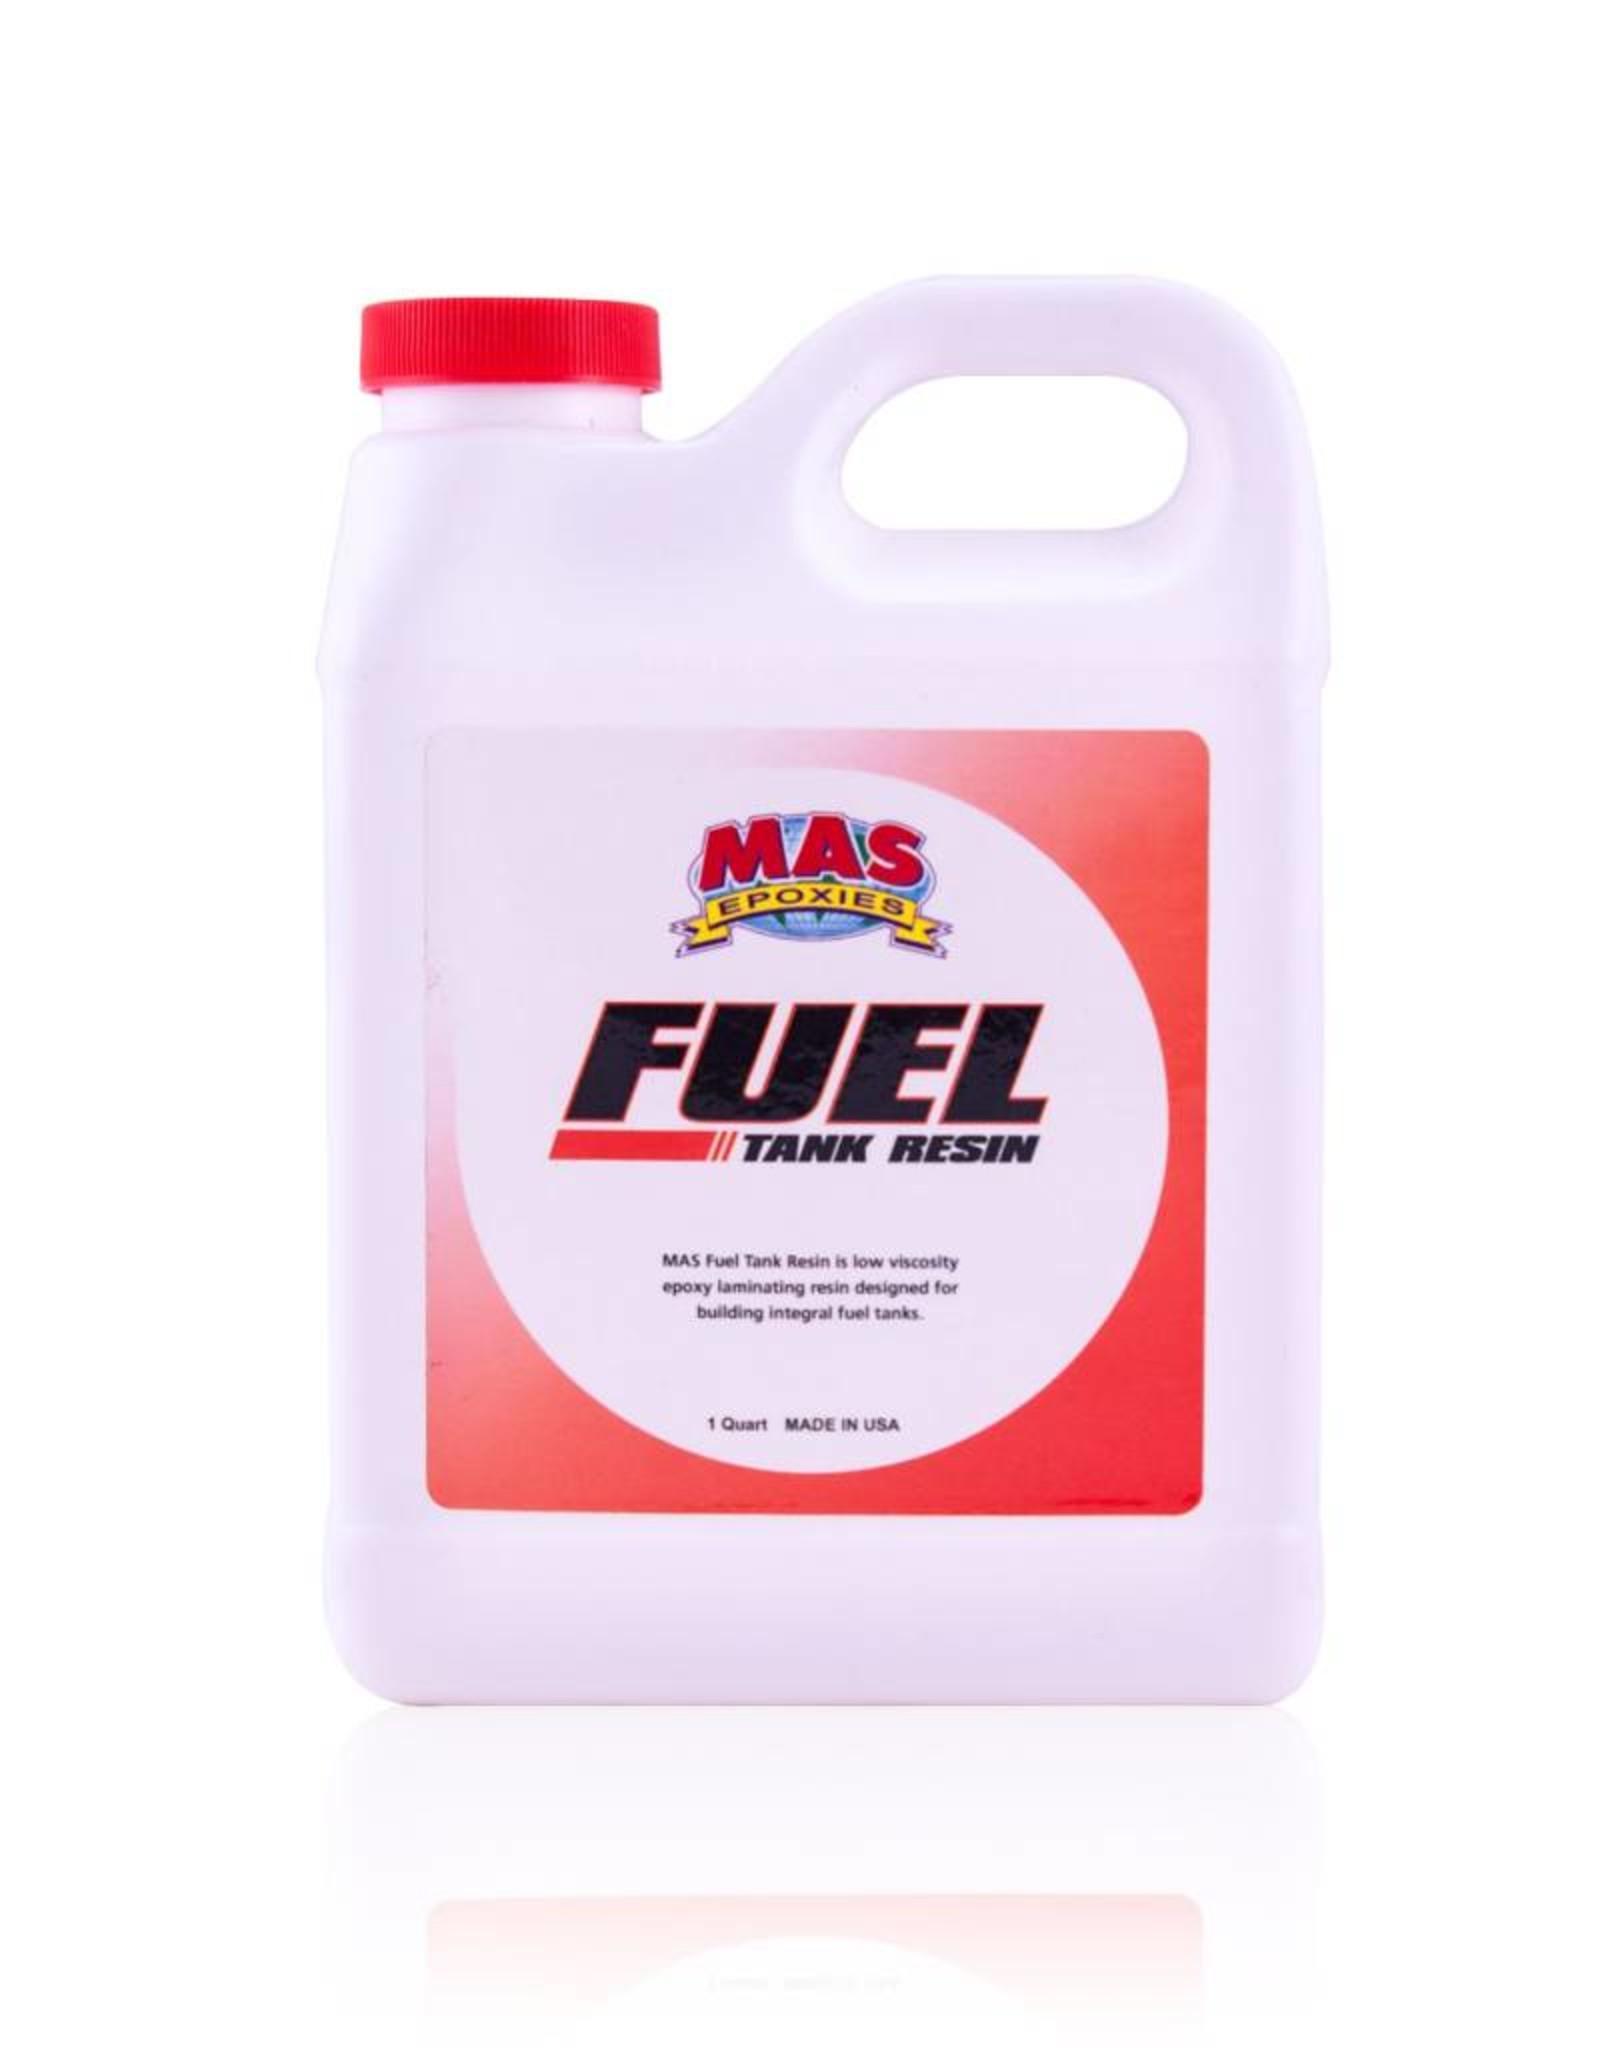 MAS EPOXY FUEL TANK RESIN 1 GAL KIT A&B 30-300